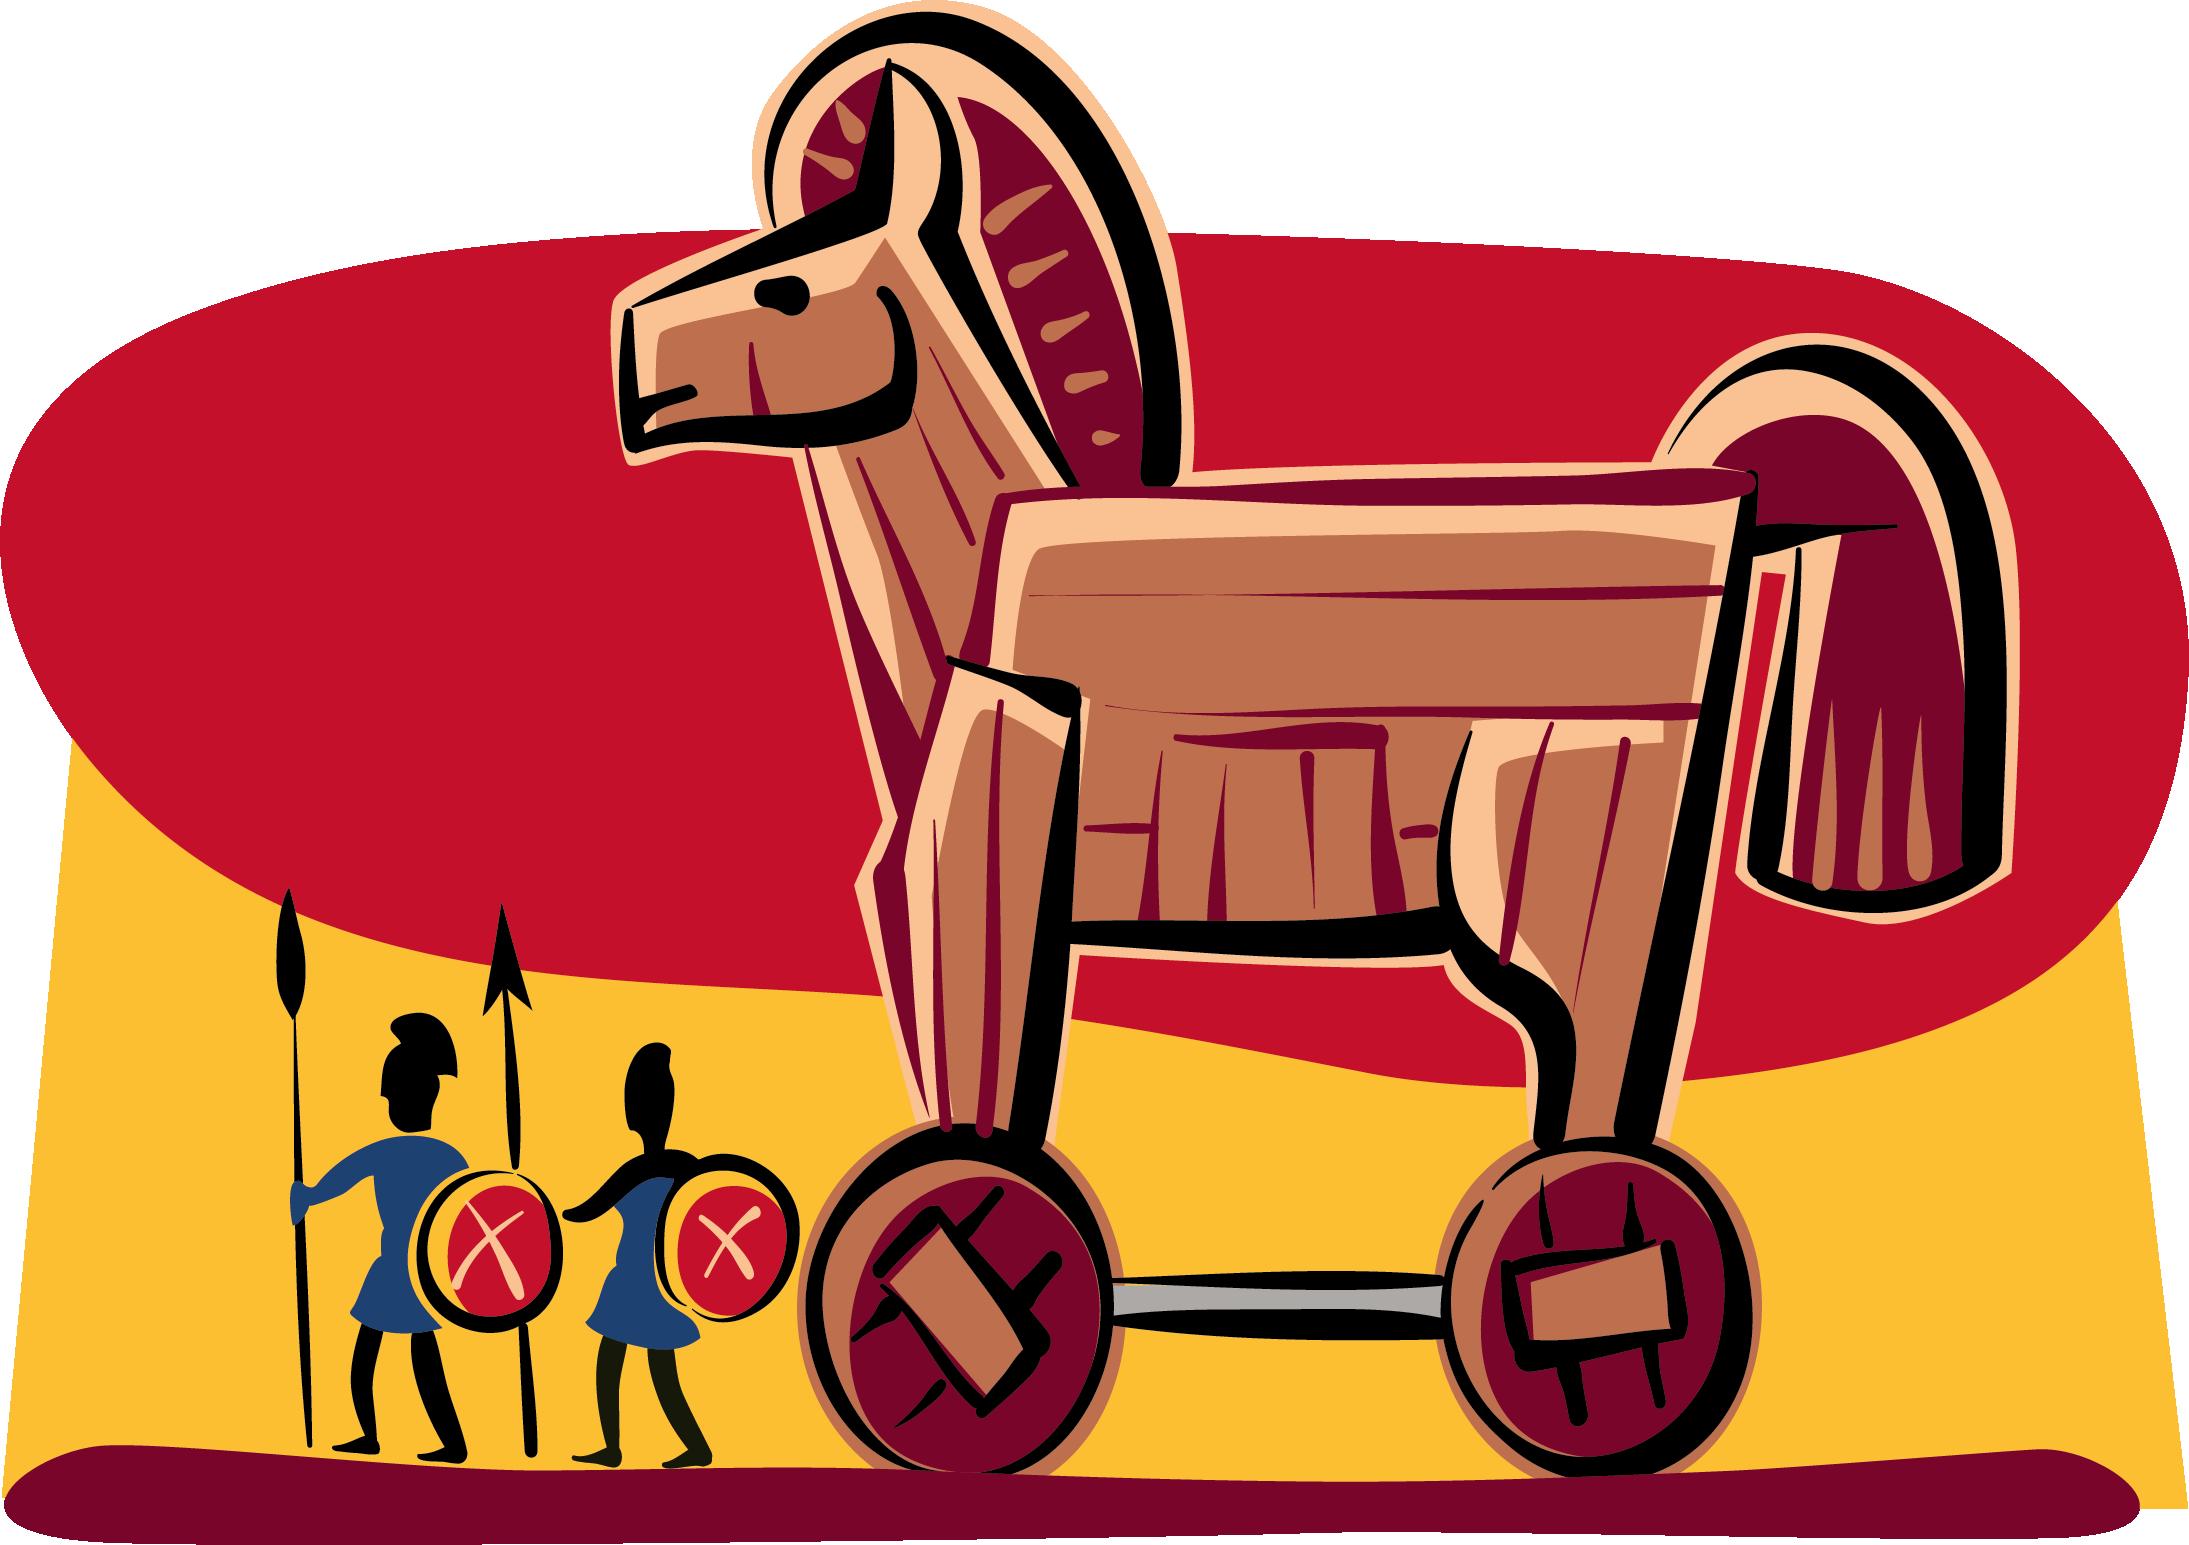 Trojan Horse Clipart at GetDrawings.com.